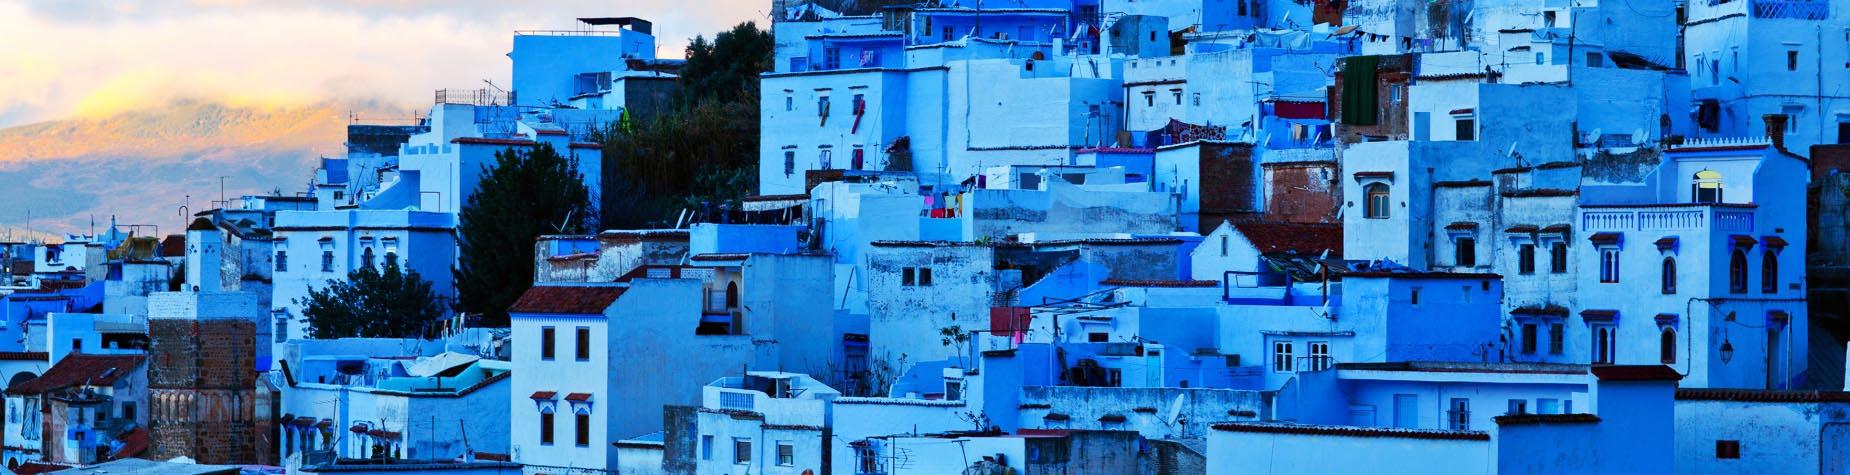 De blauwe stad Chefchaouen